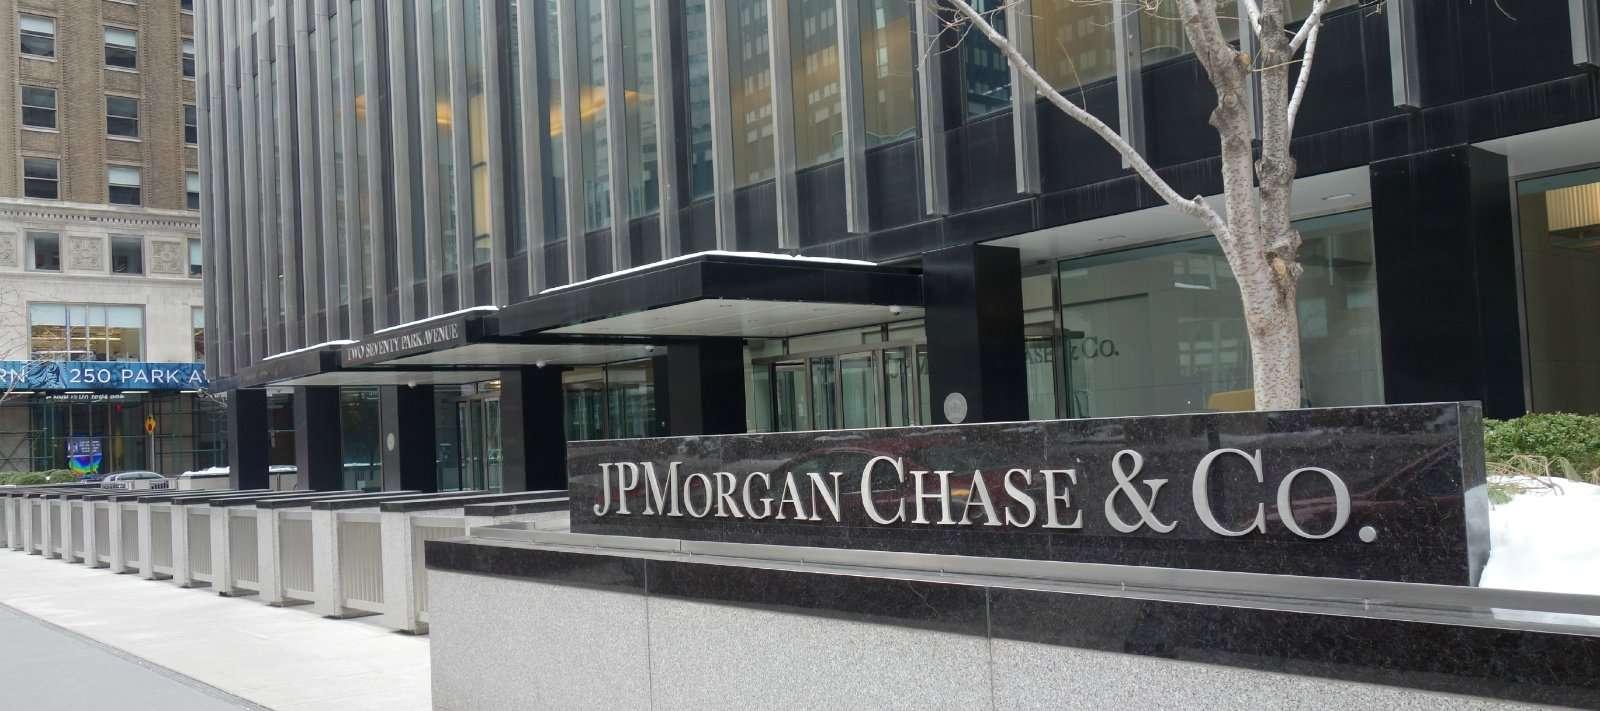 jpmorgan & chase logo